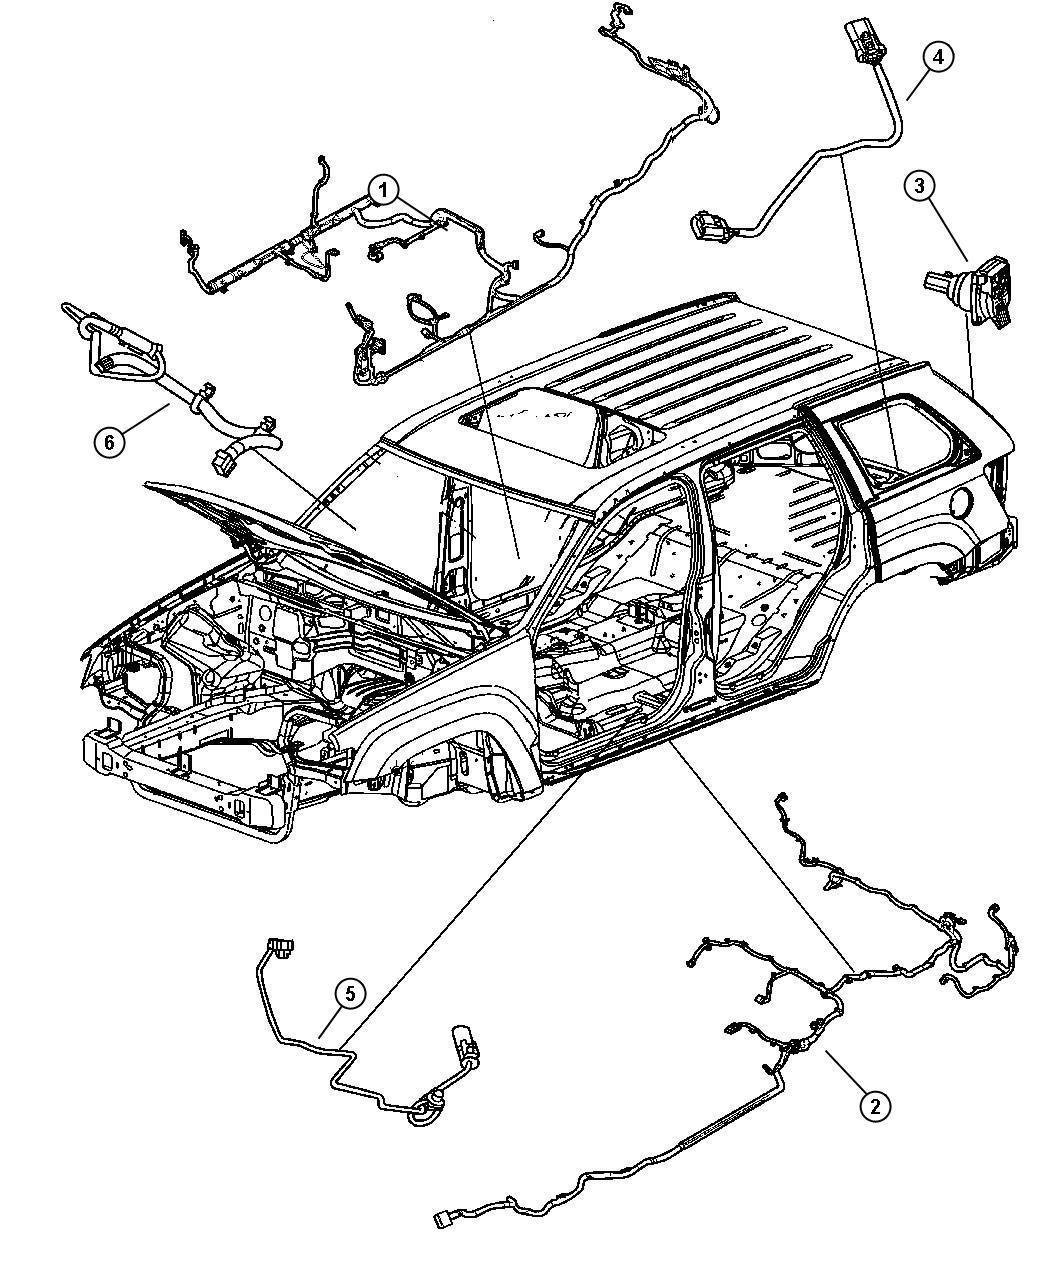 2006 Jeep Grand Cherokee Wiring. Fuel module. Tank, skid